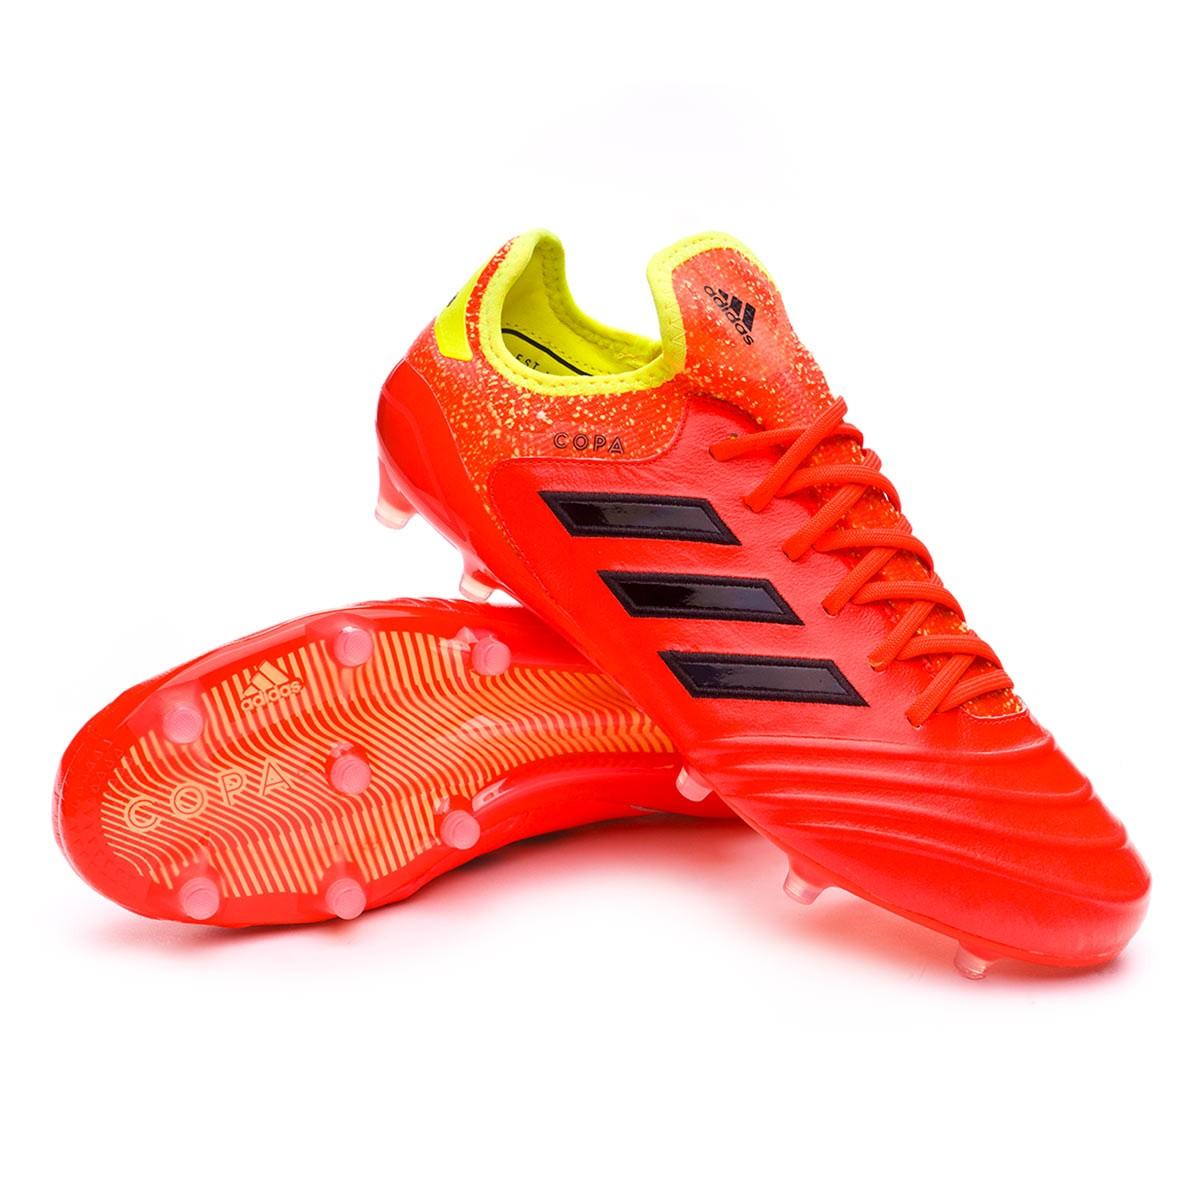 new arrival ccc1d 13caa adidas Copa 18.1 FG Boot